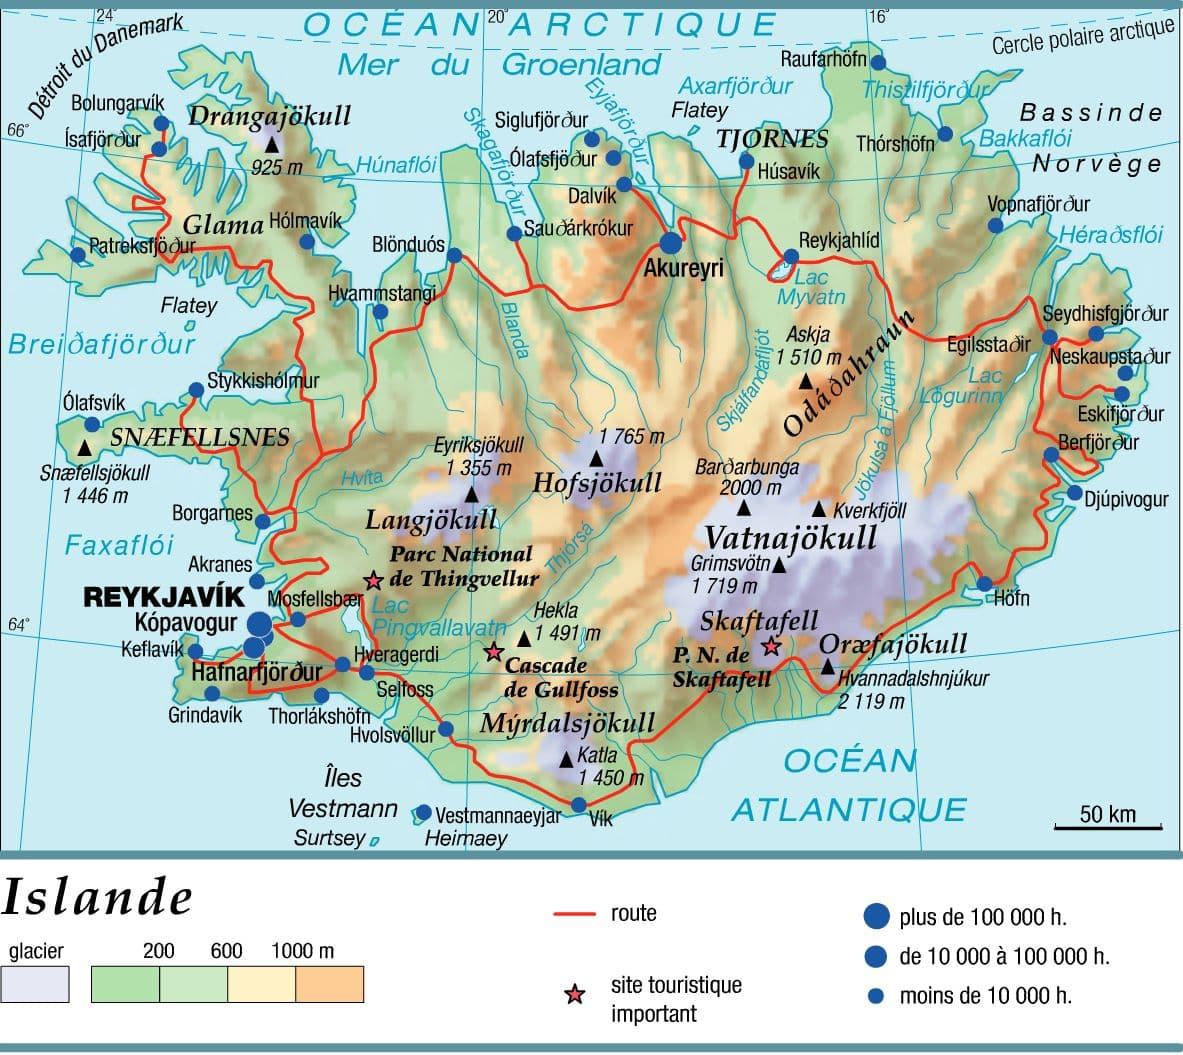 https://www.larousse.fr/encyclopedie/data/cartes/1306078-Islande.HD.jpg